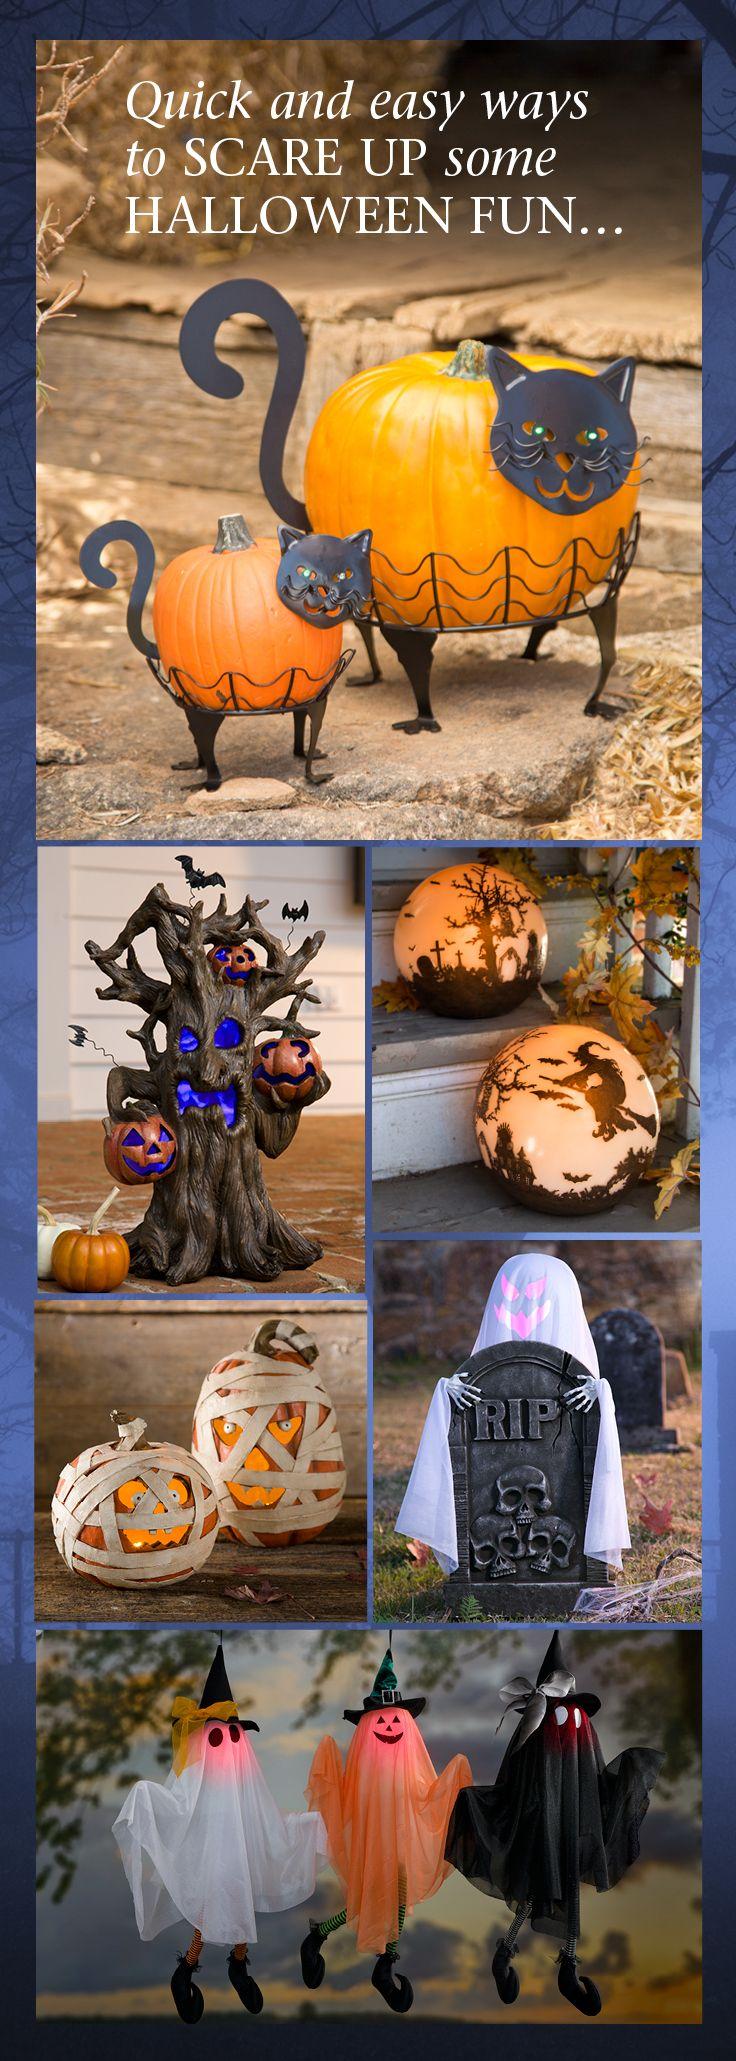 spook tacular halloween ideas halloween funhalloween decorationspartyfall